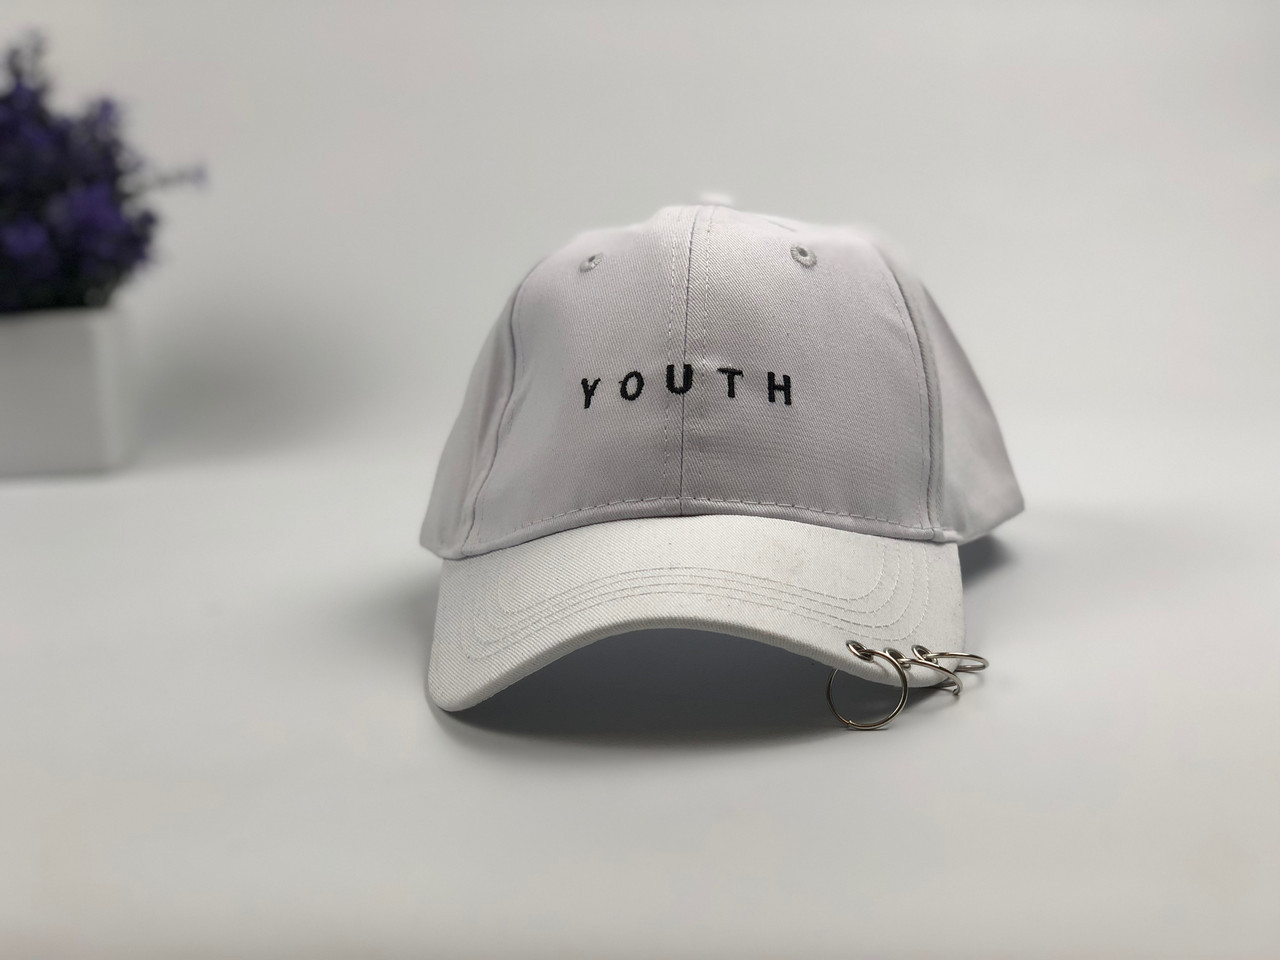 Кепка бейсболка Youth (белая) с кольцами